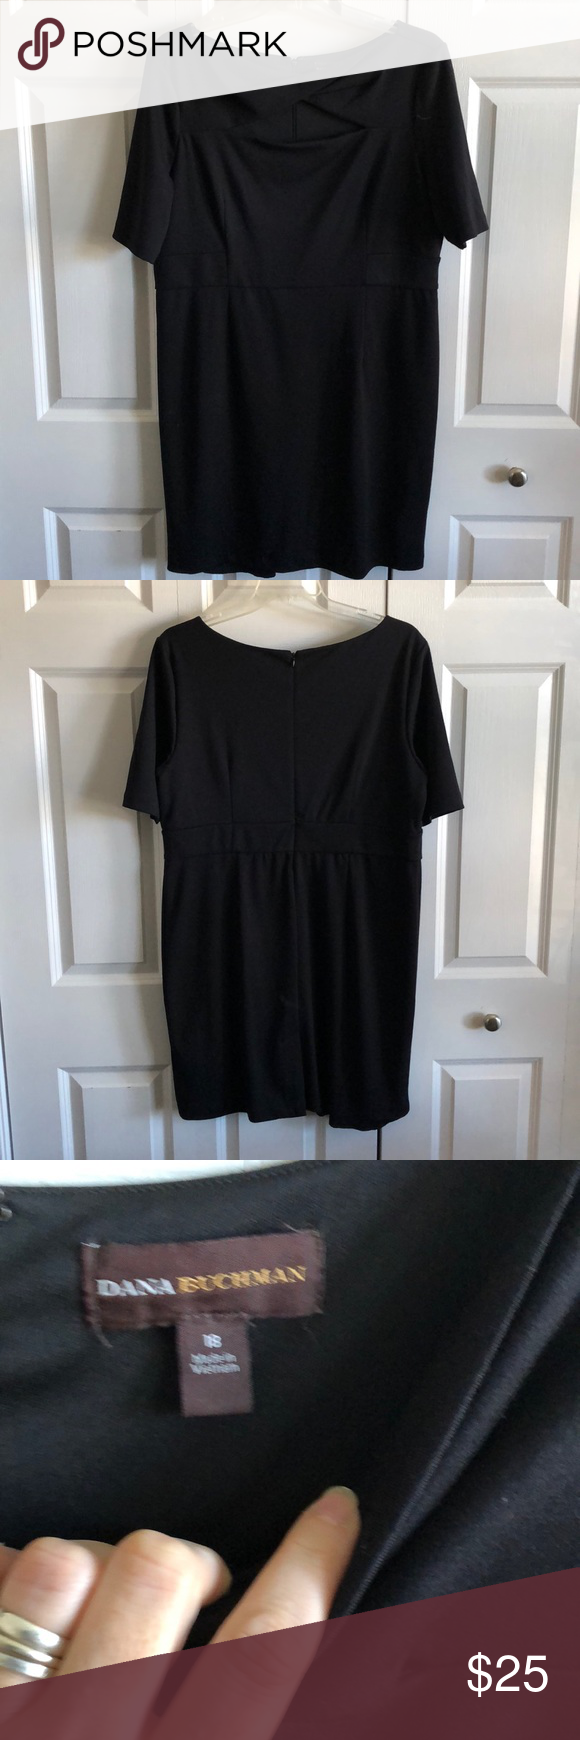 Dana Buchman Size 18 Black Dress Black Houndstooth Dress Silk Dress Vintage Black Dress [ 1740 x 580 Pixel ]